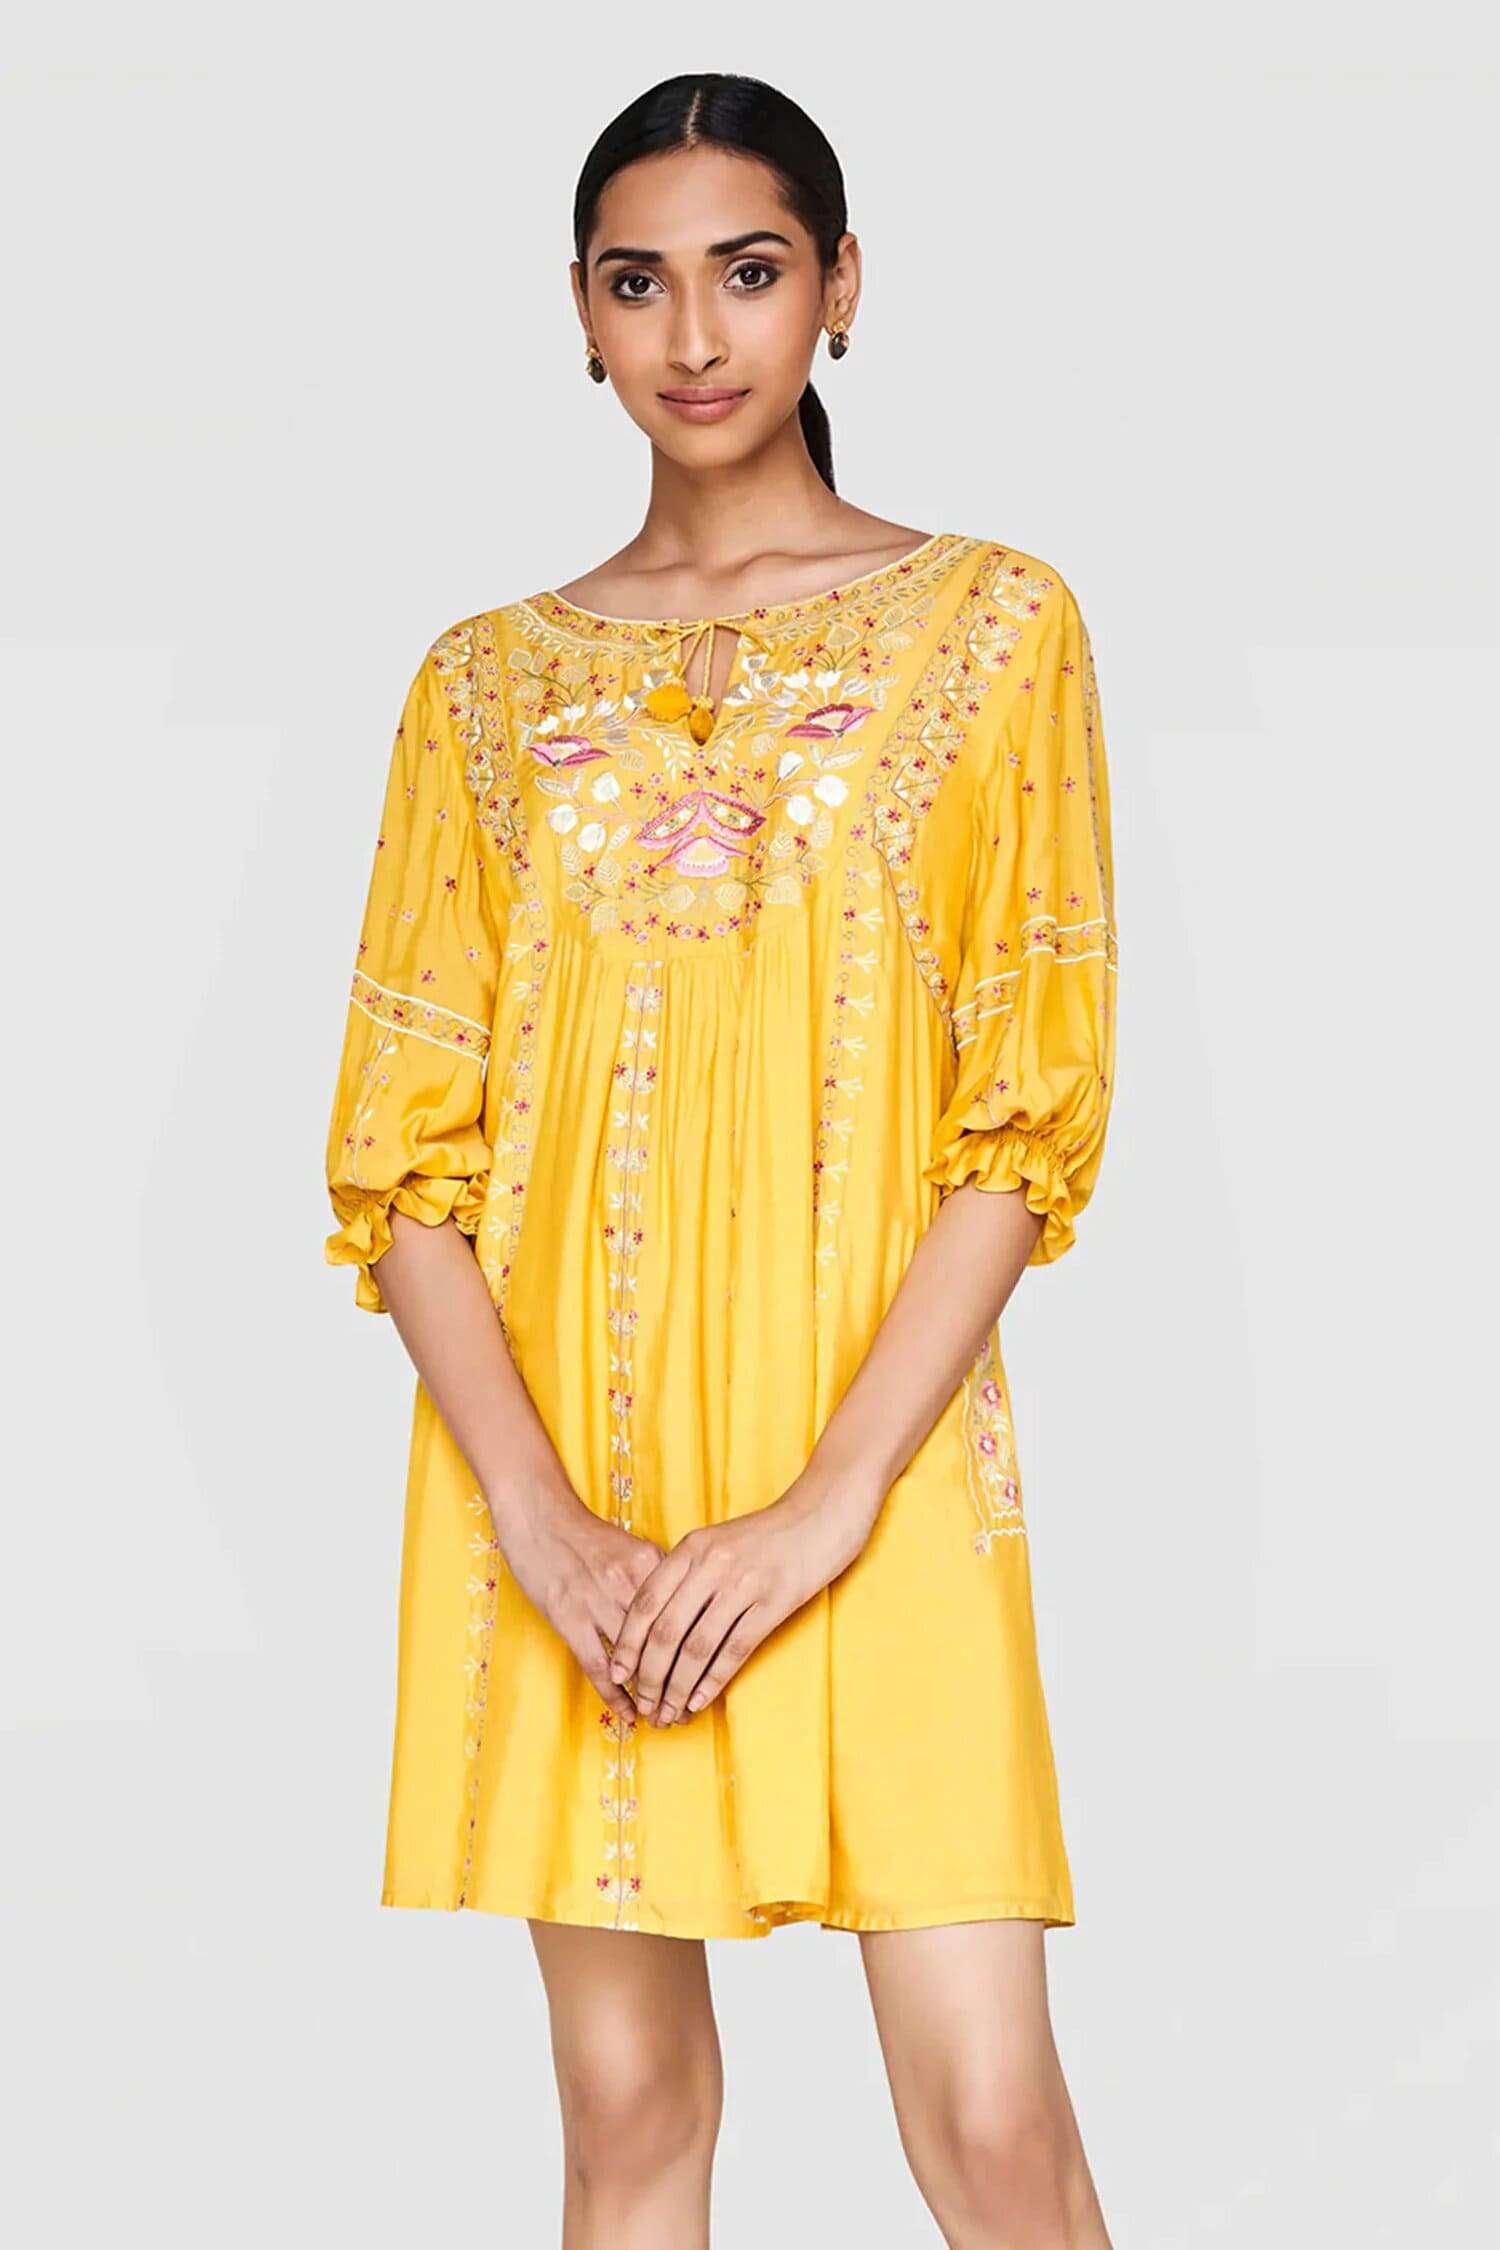 Anita Dongre Thera Dress